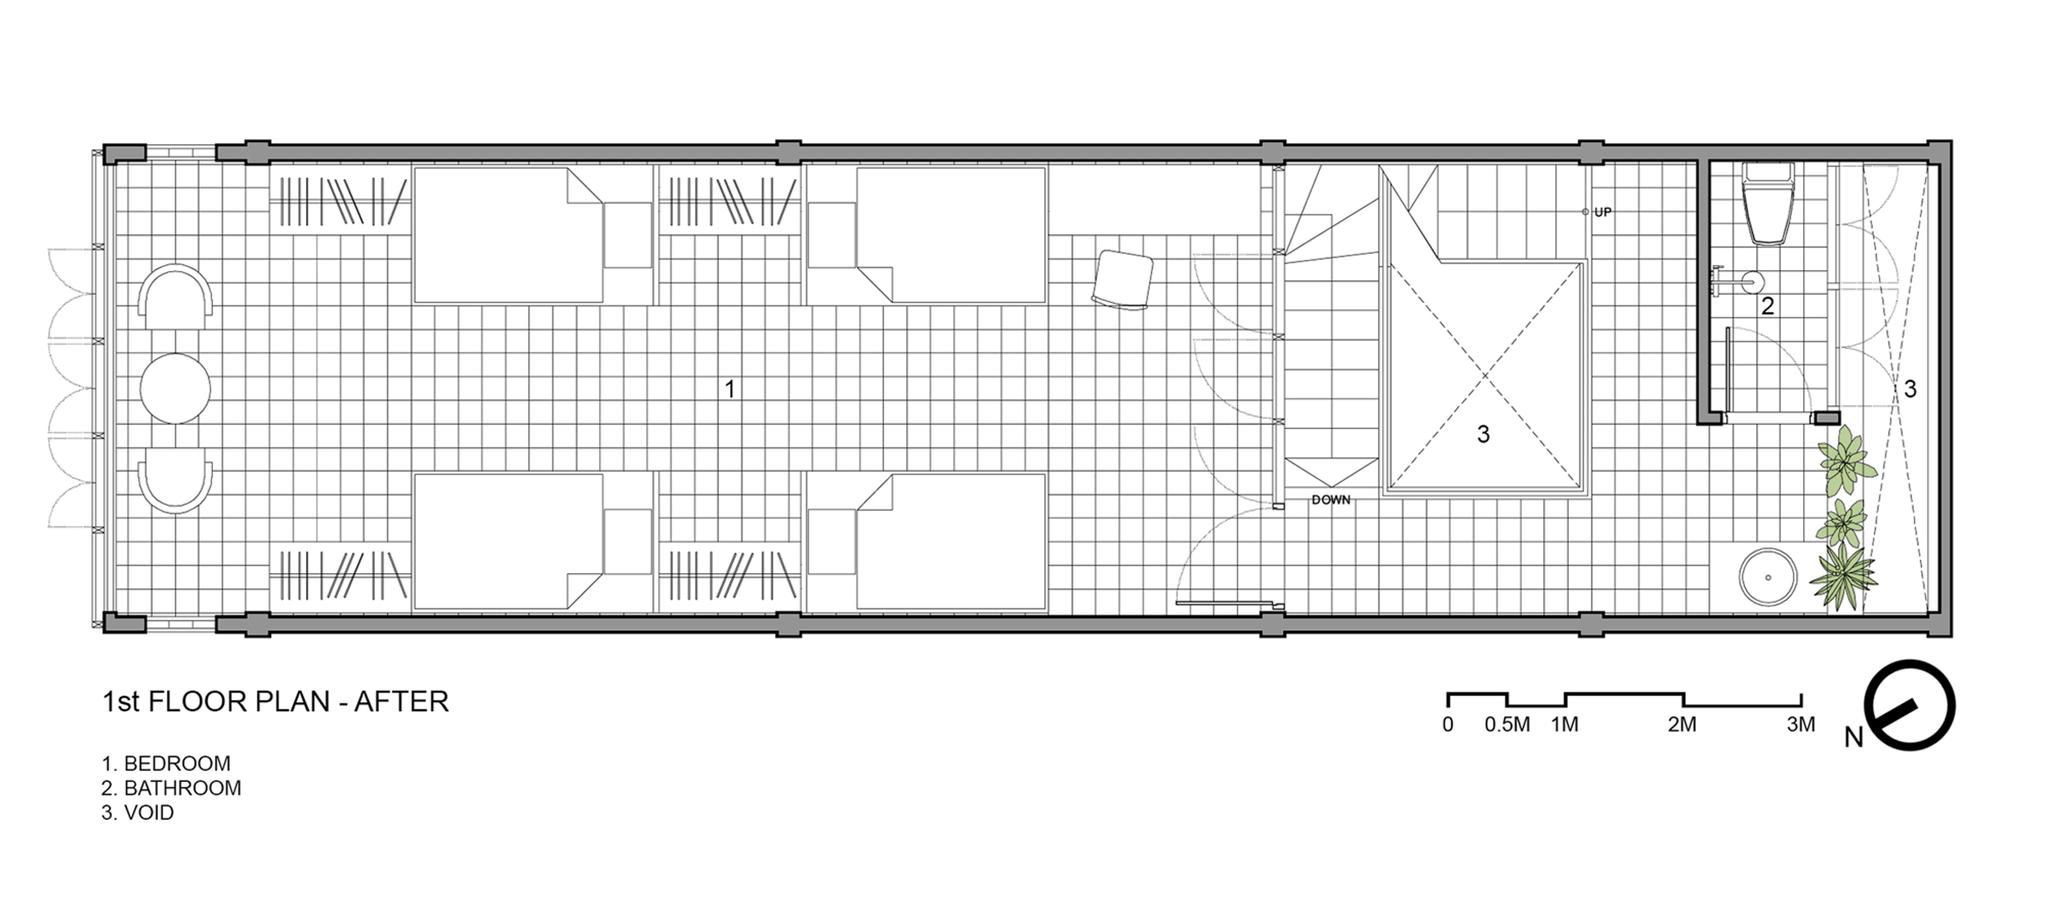 557a5baae58ecedce5000215_vegan-house-block-architects_23 (Copy)